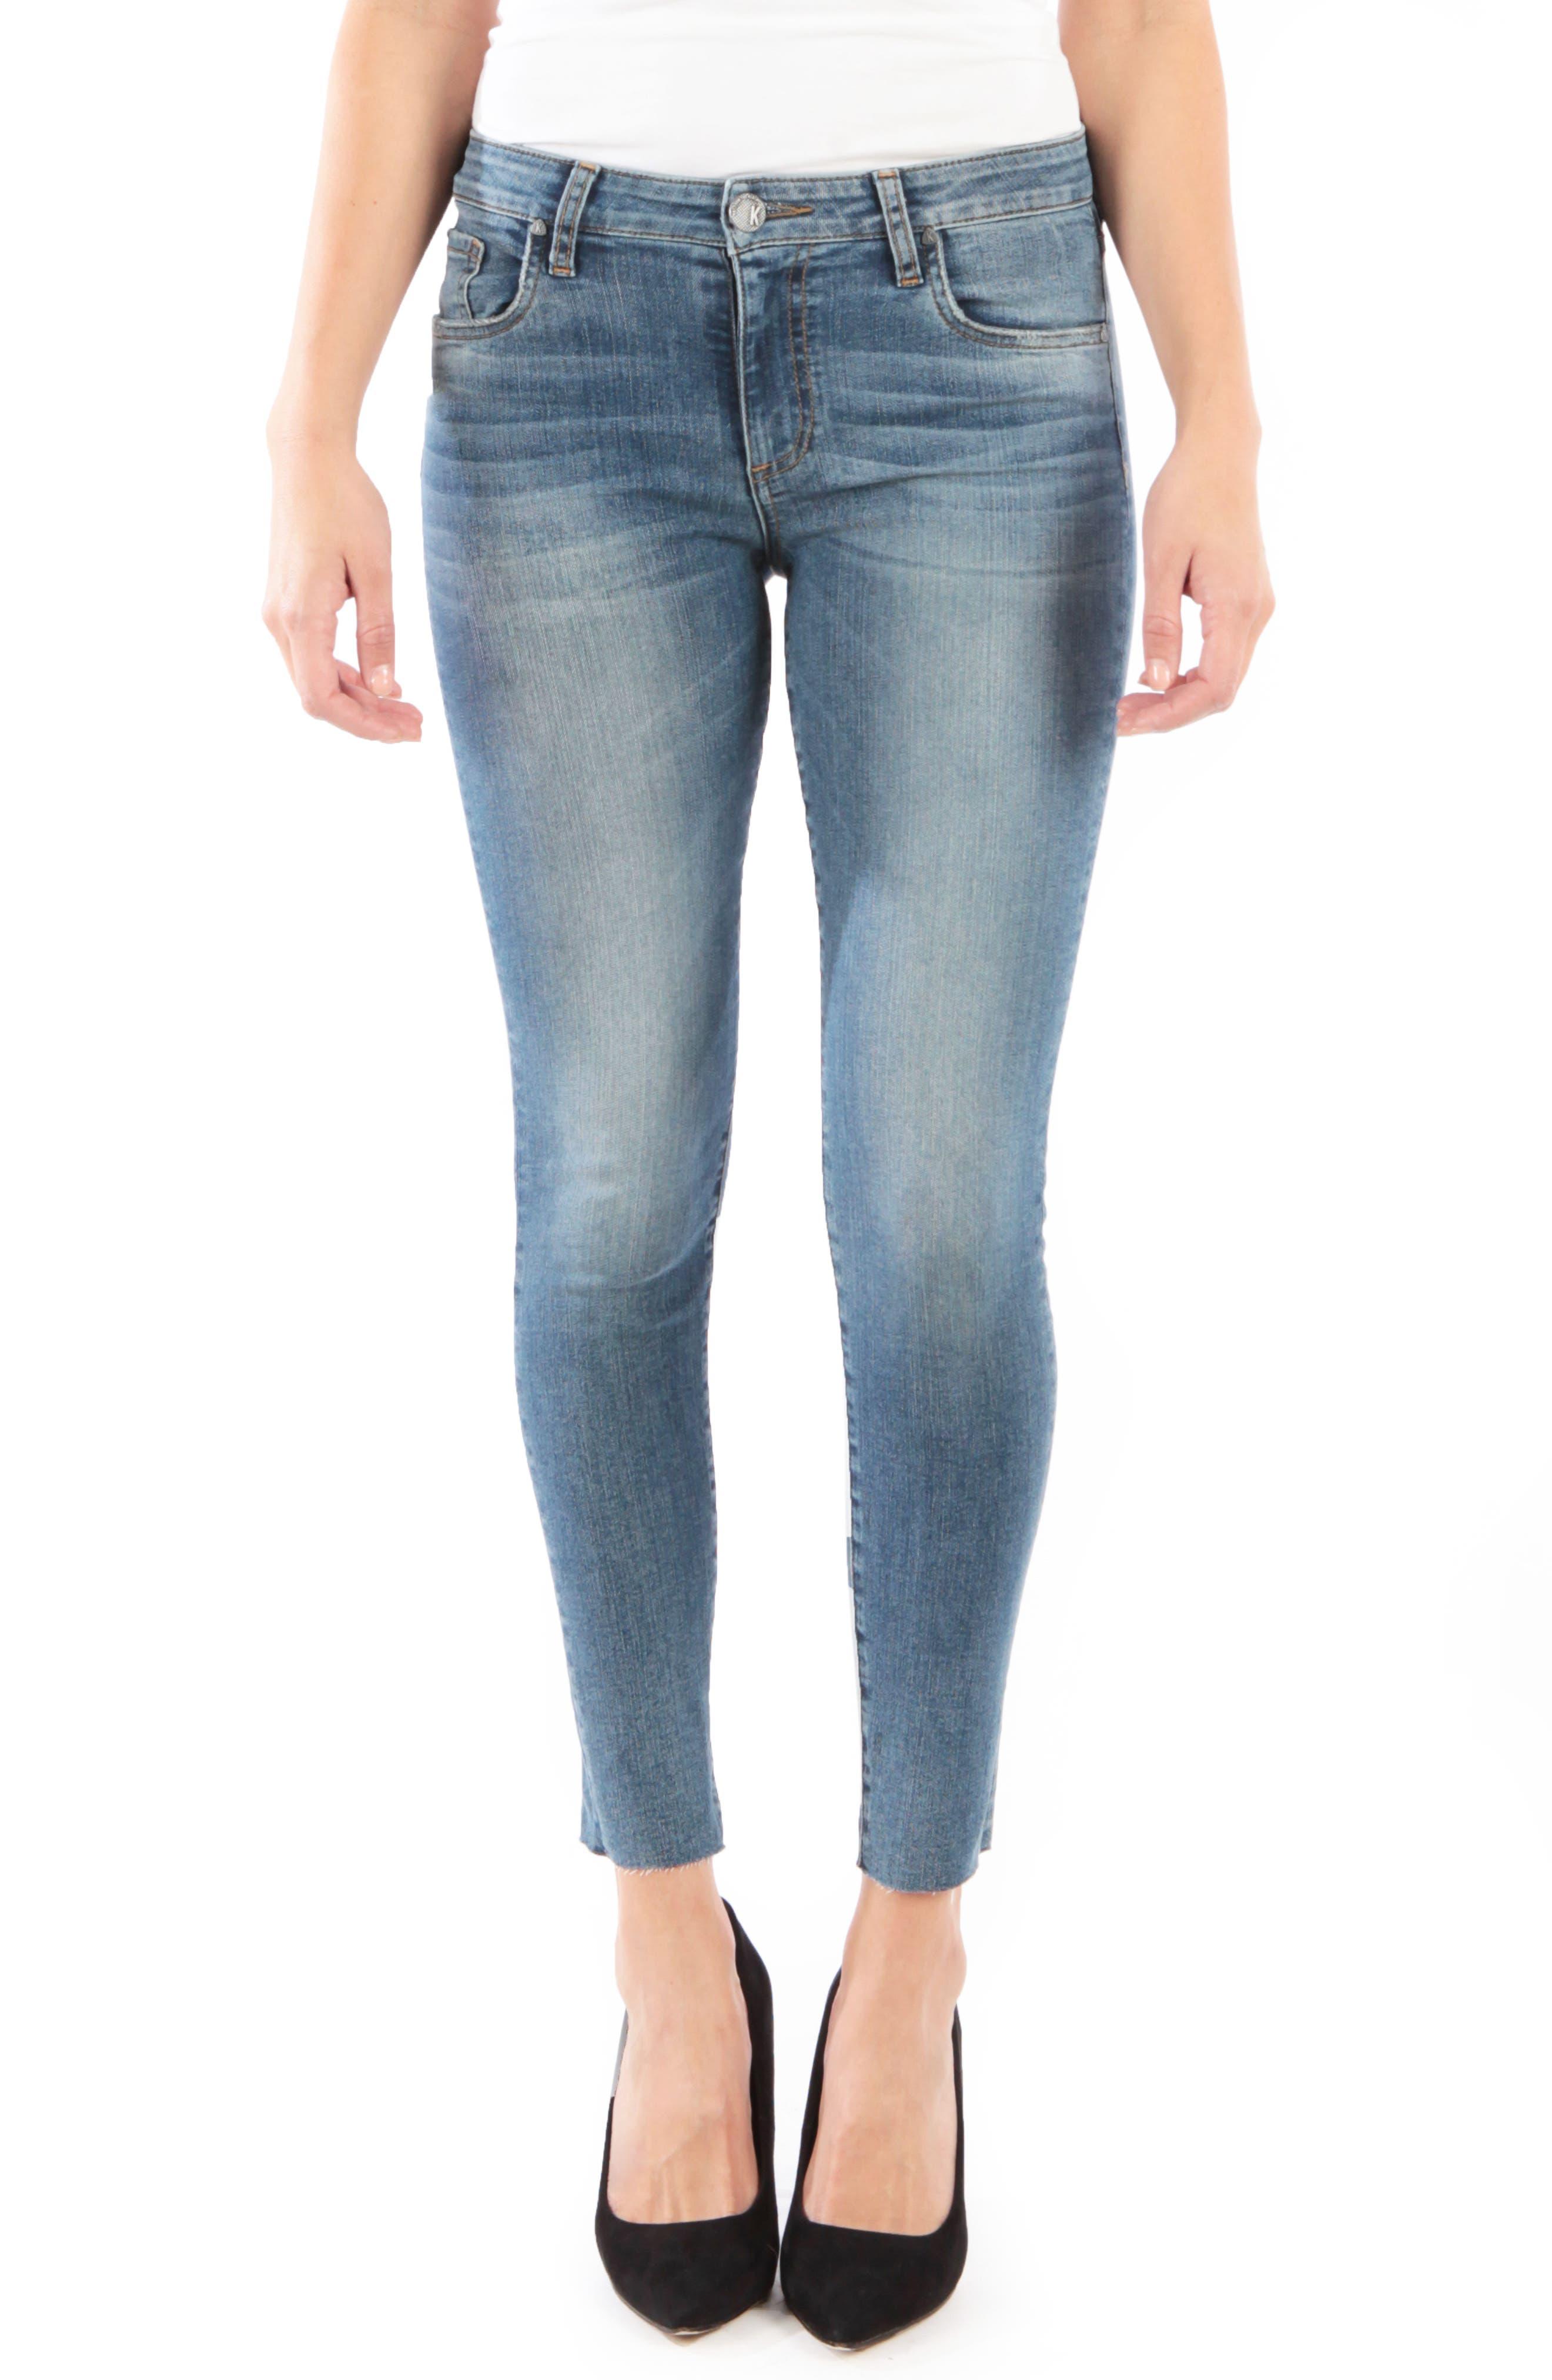 Petite Kut From The Kloth Donna High Waist Raw Hem Skinny Jeans, Blue